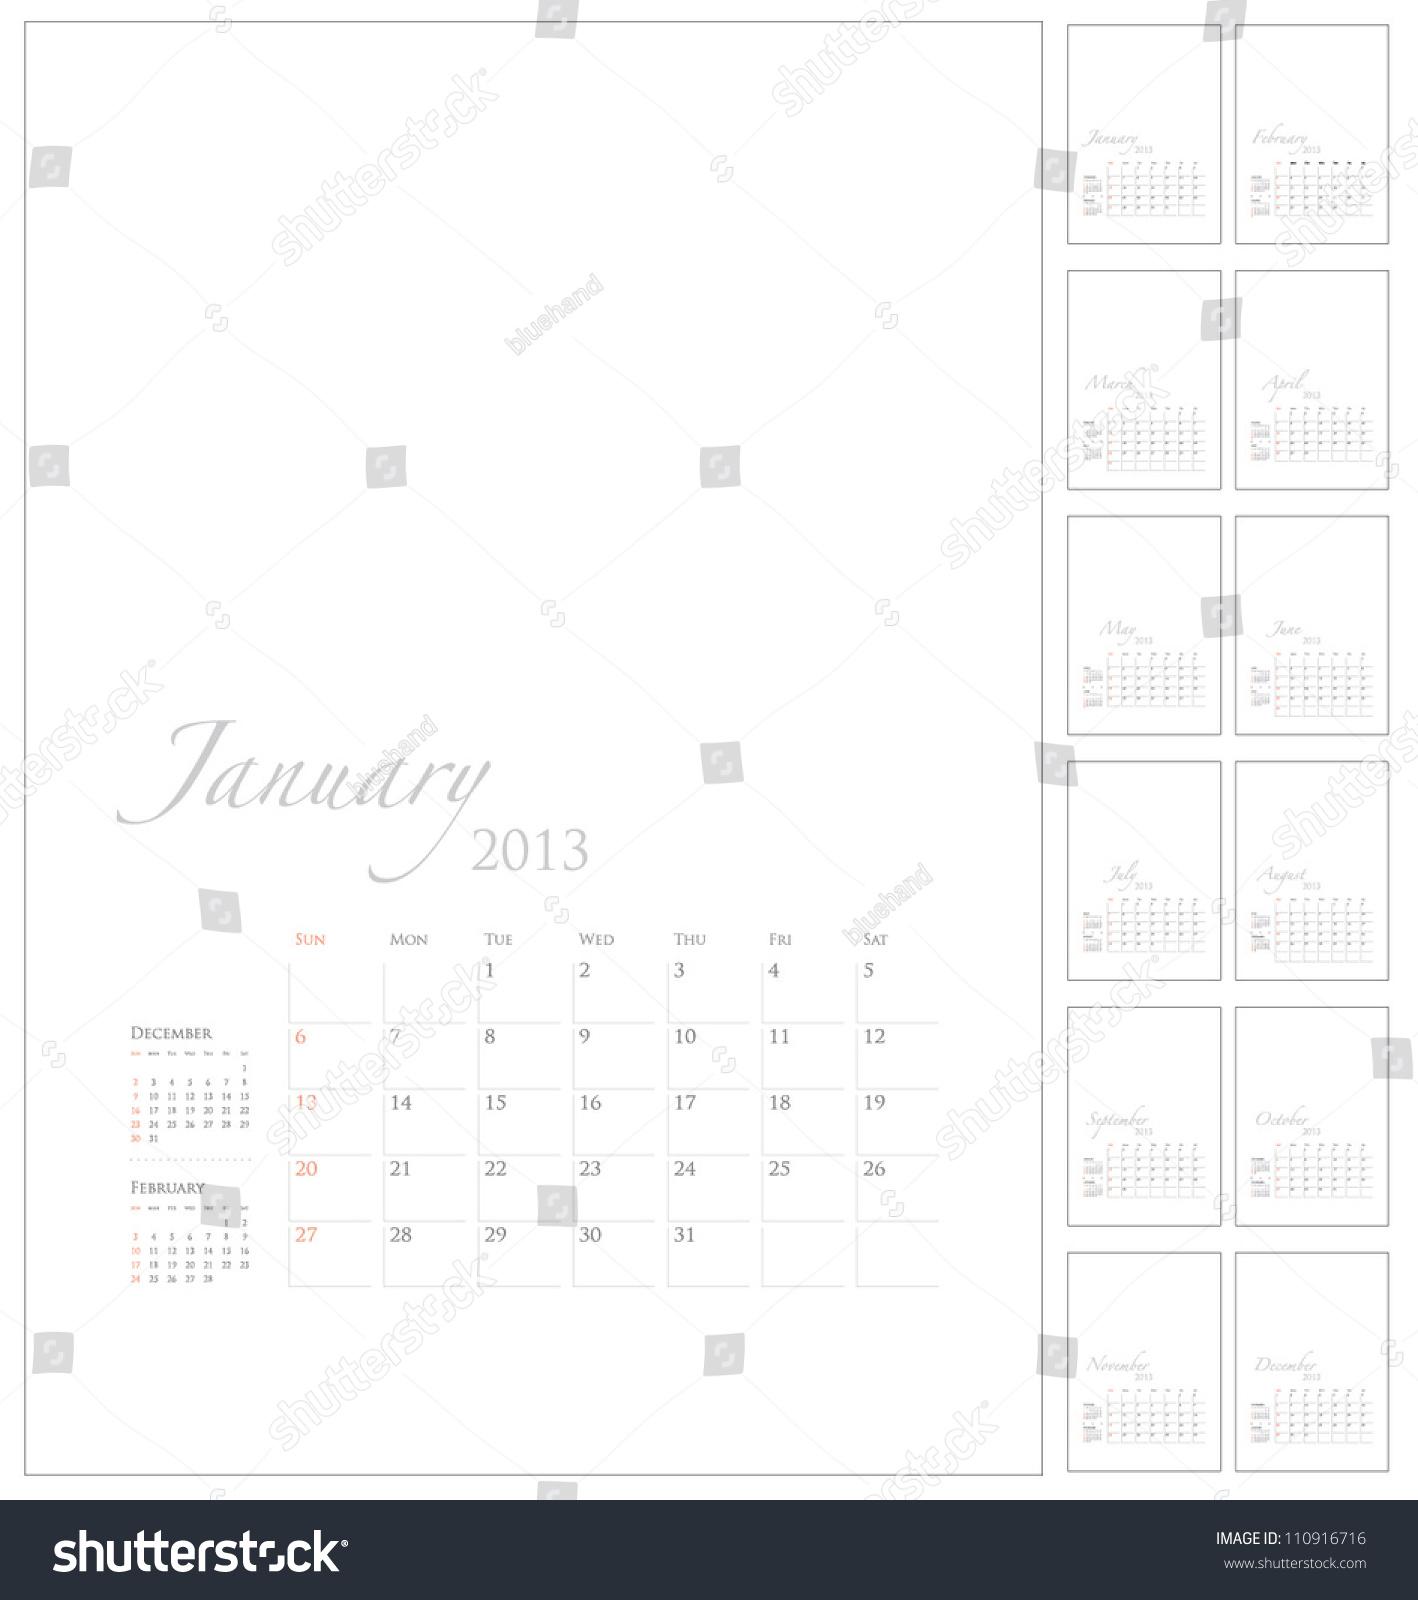 2013 calendar template picture space stock vector 110916716 cute calendar templates 2013 calendar template with picture